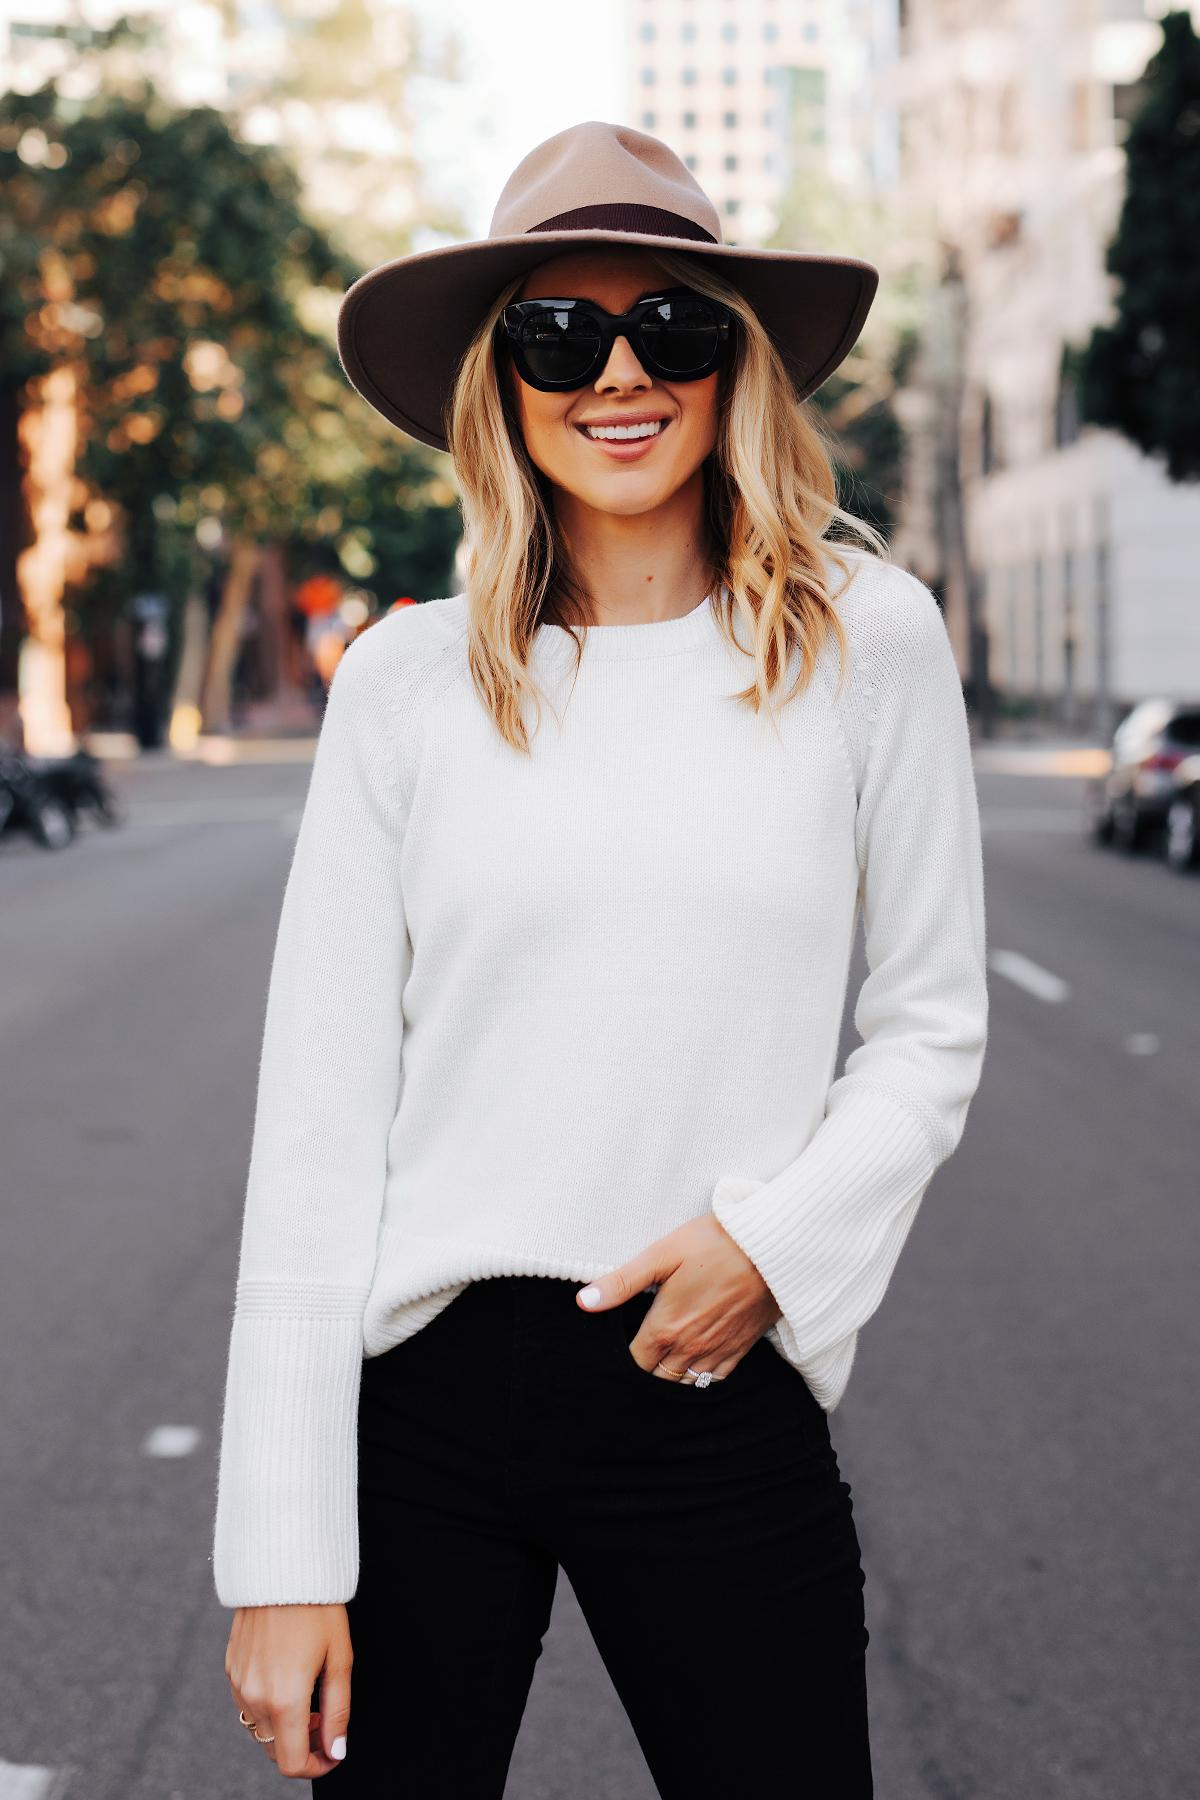 Fashion Jackson Wearing Ann Taylor Floppy Wool Hat Ann Taylor White Sweater Black Skinny Jeans